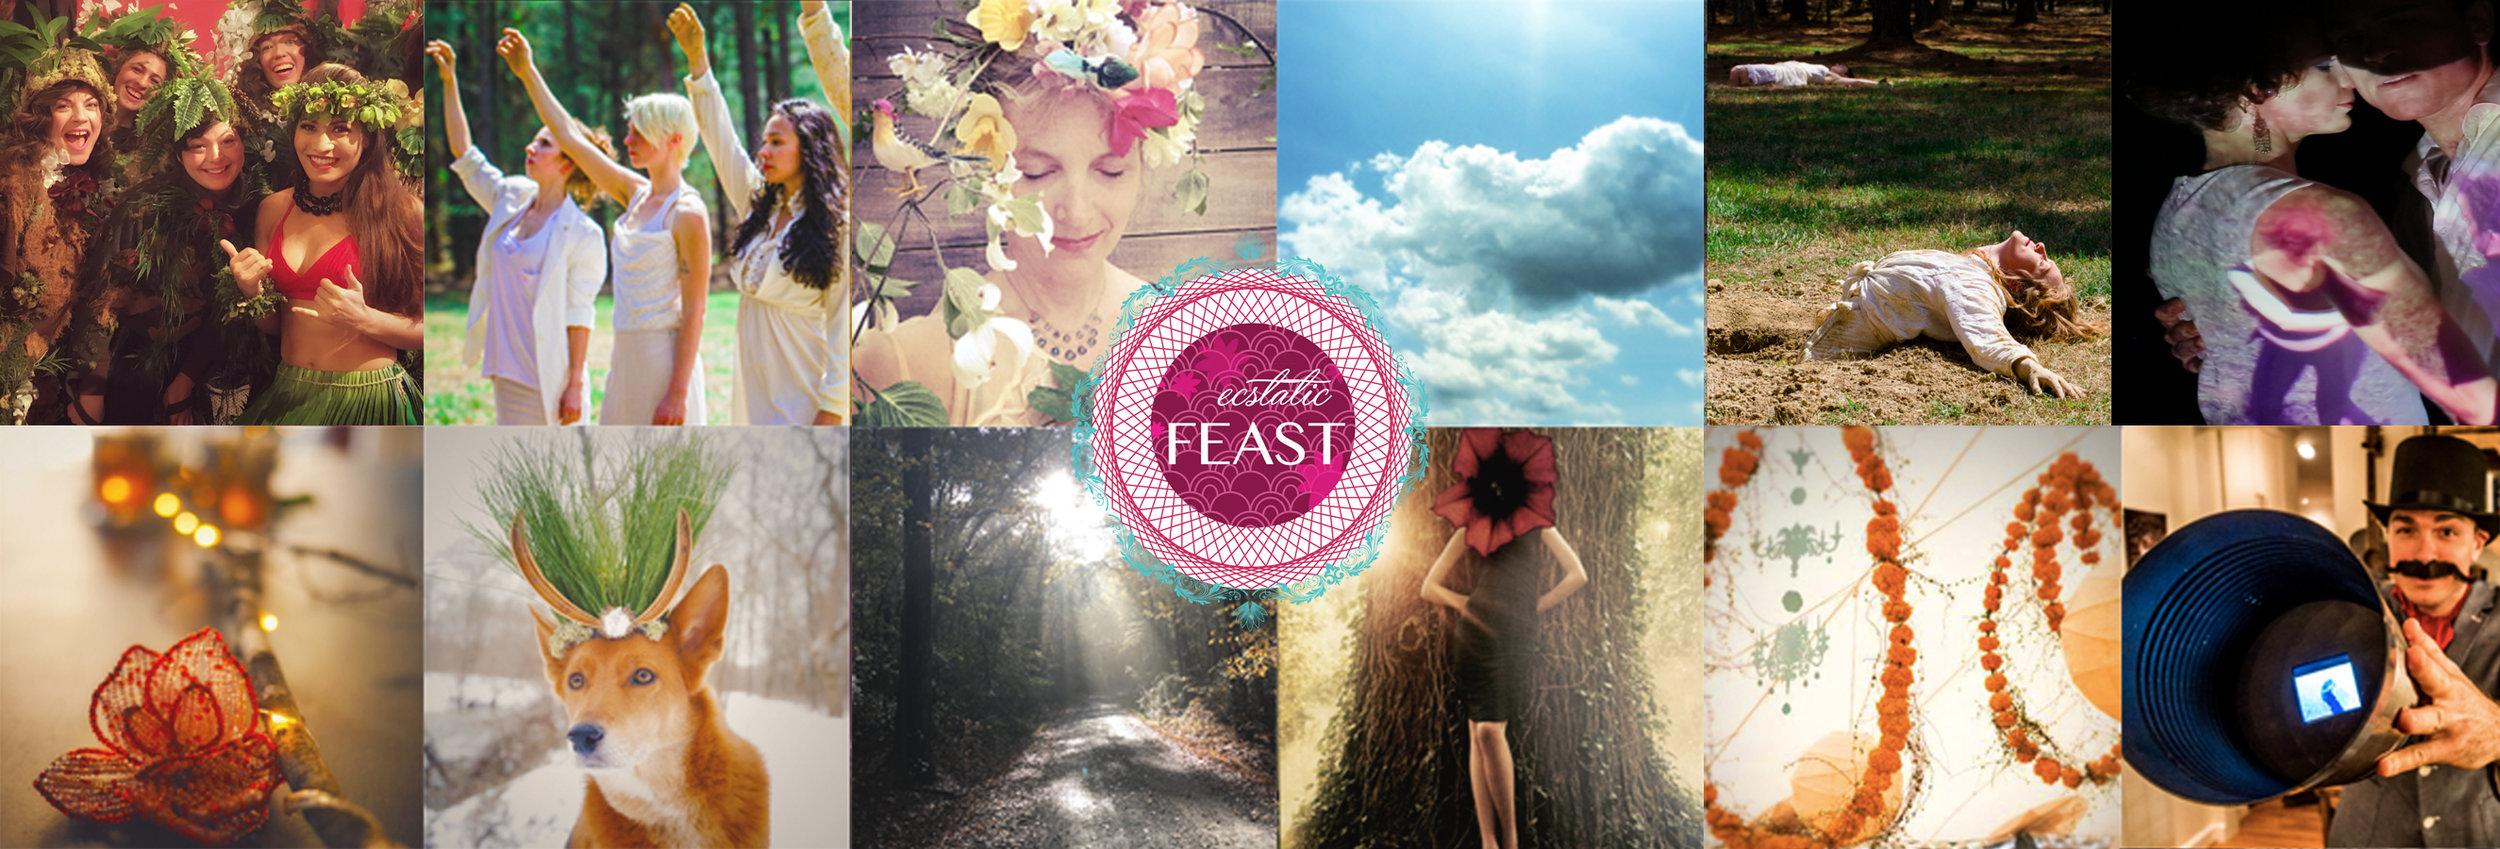 ECSTATIC feast banner.jpg